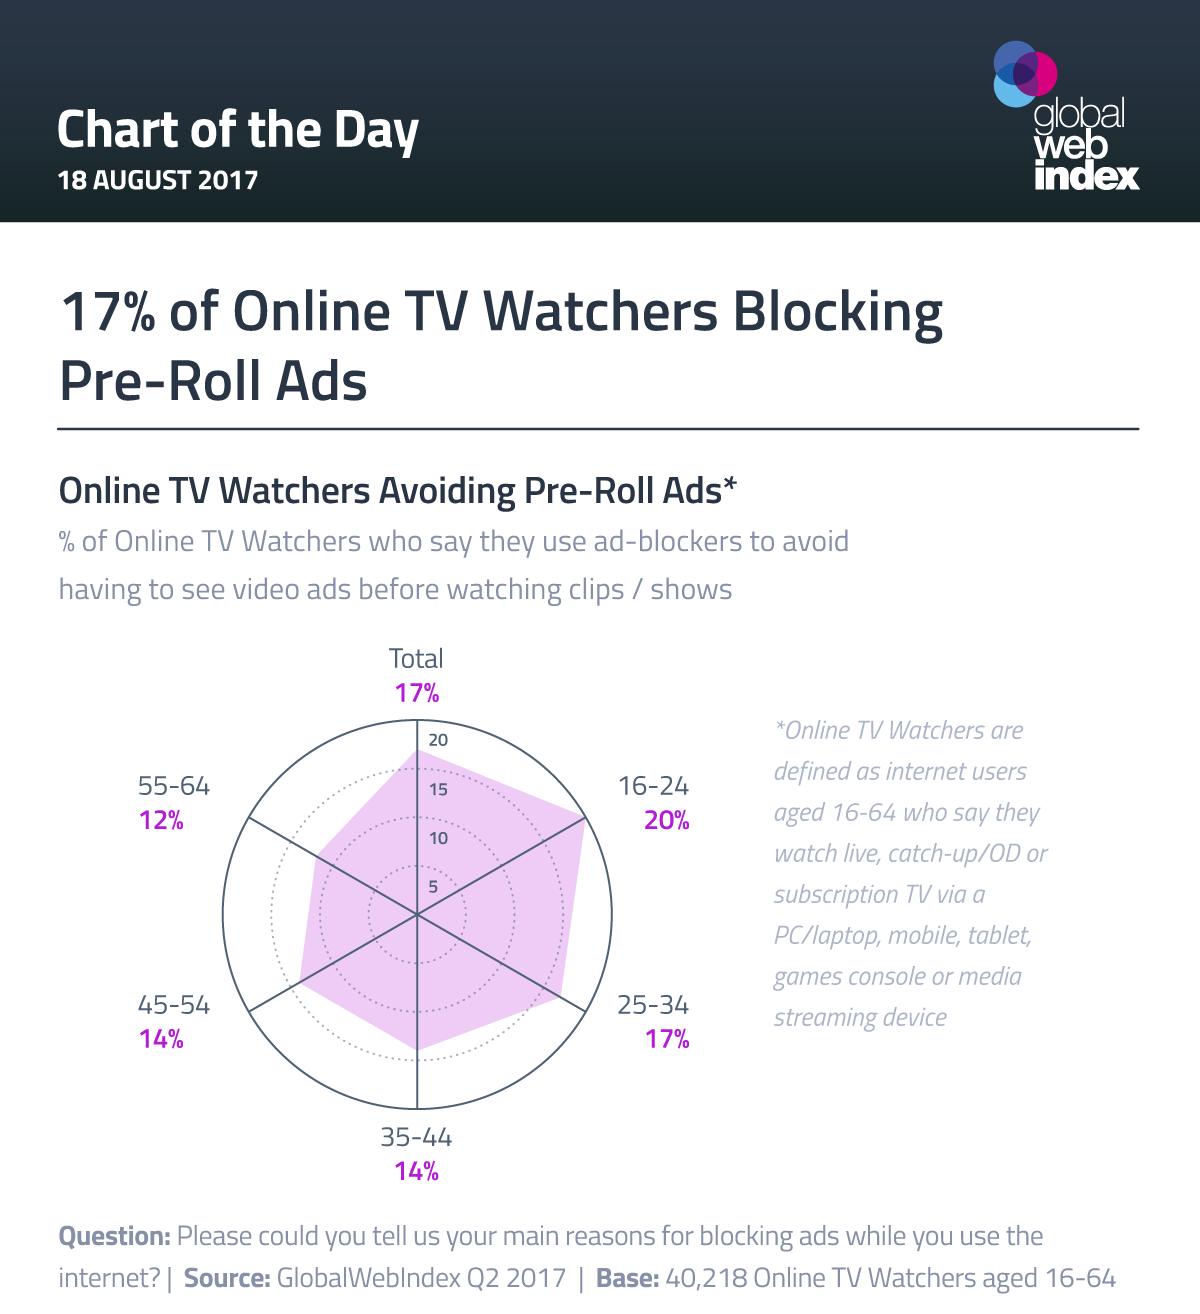 17% of Online TV Watchers Blocking Pre-Roll Ads